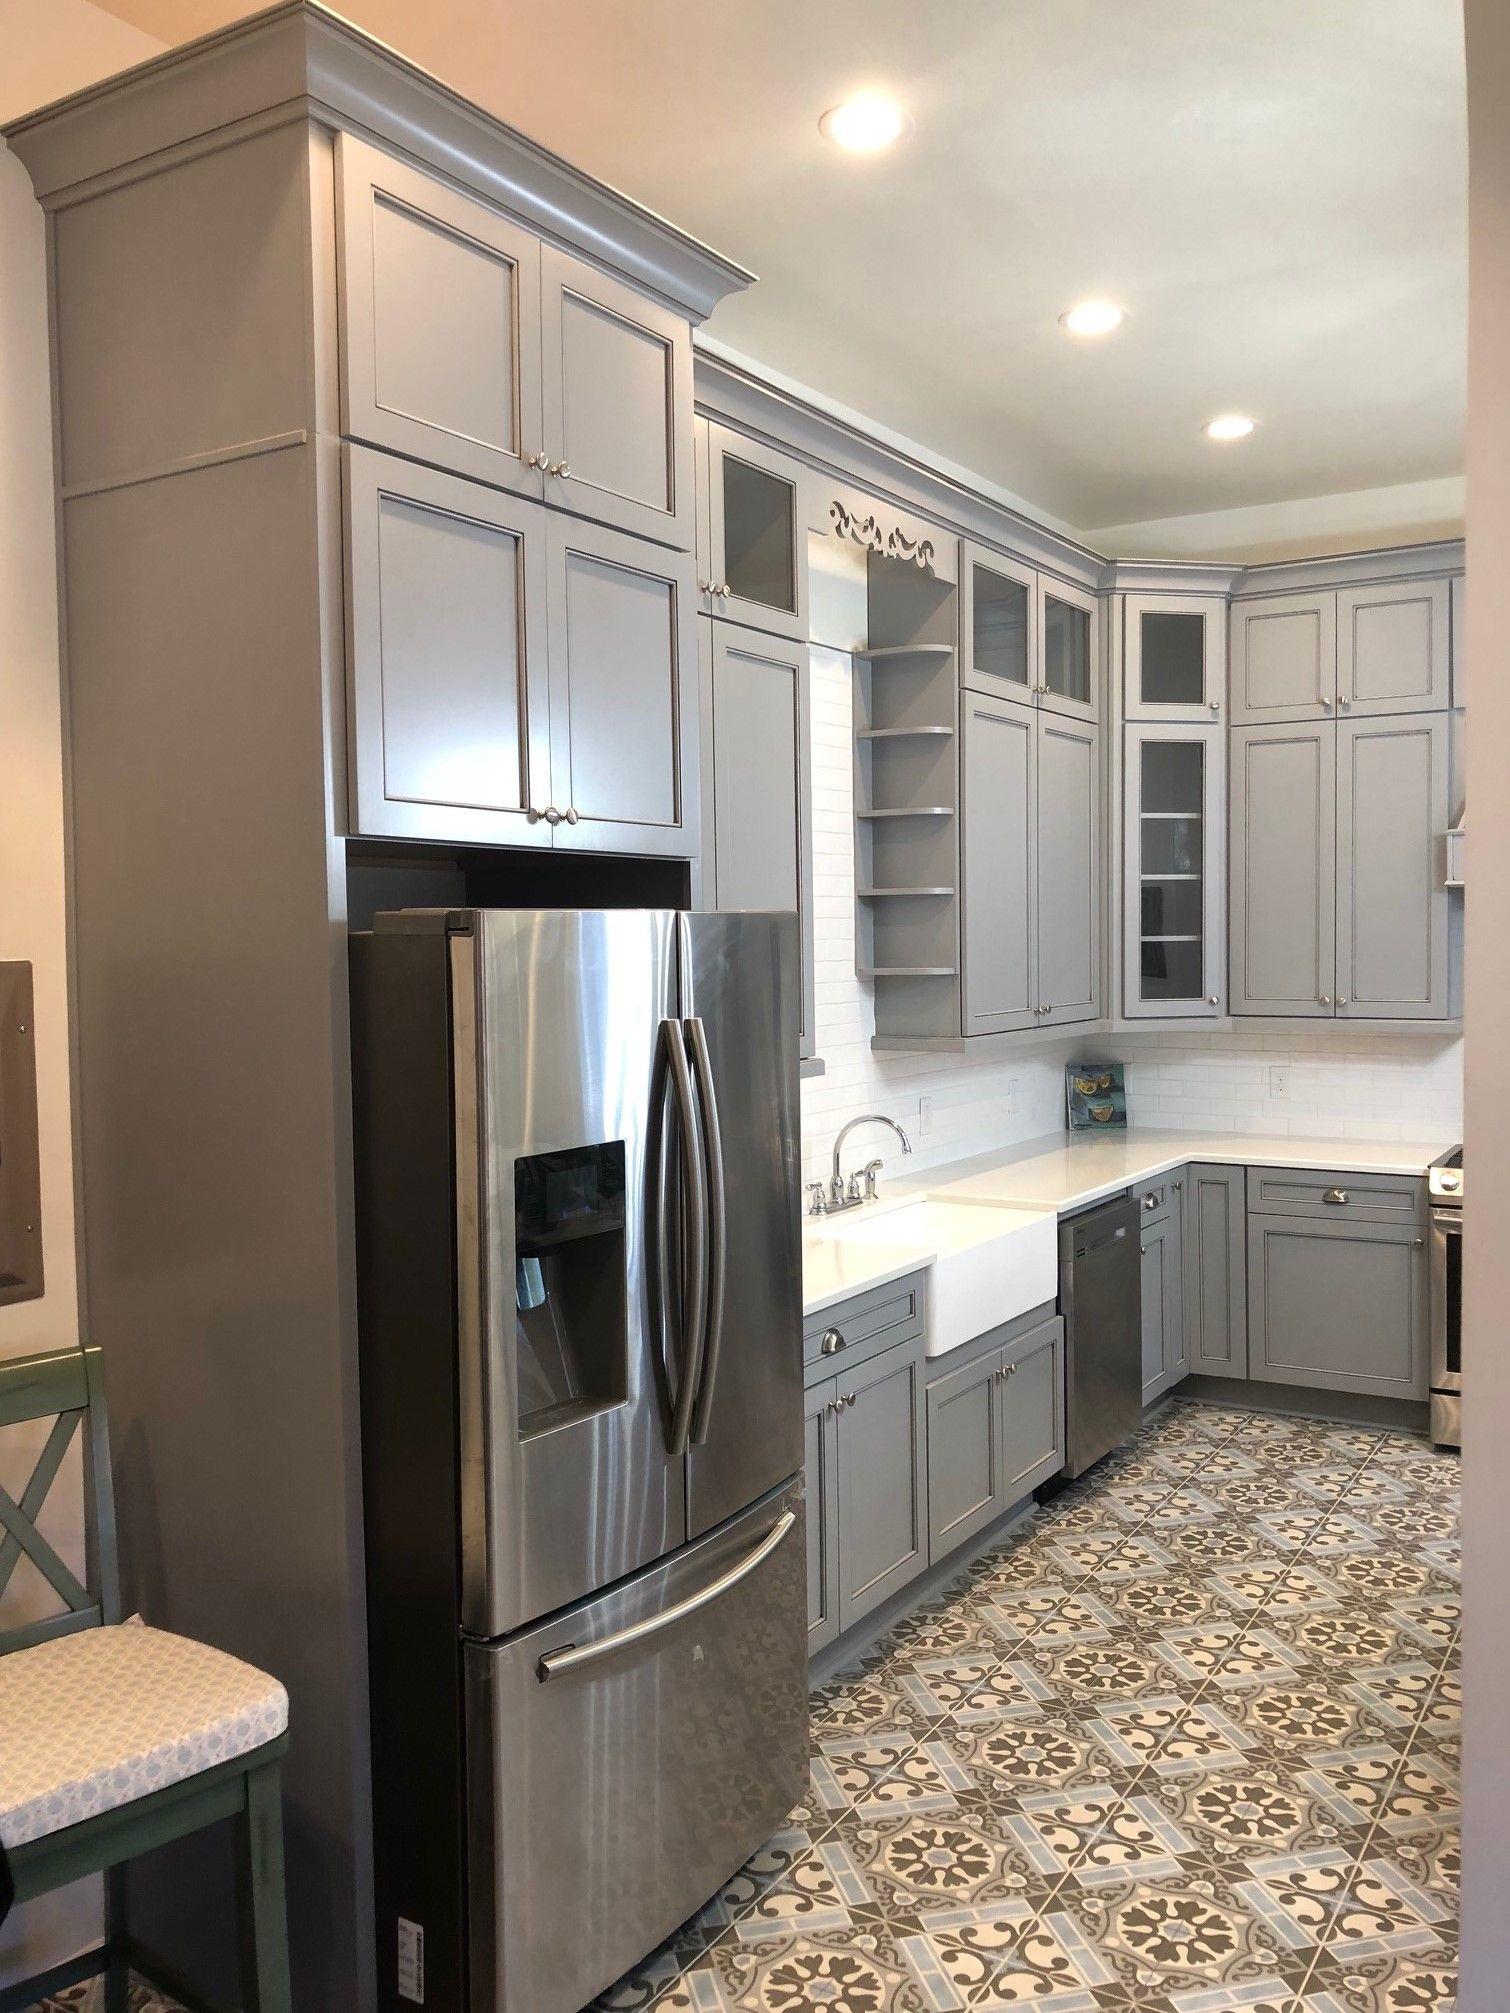 Beautiful Kitchen Remodel Kitchen Cabinet Remodel Wholesale Kitchen Cabinets Kitchen Cabinets